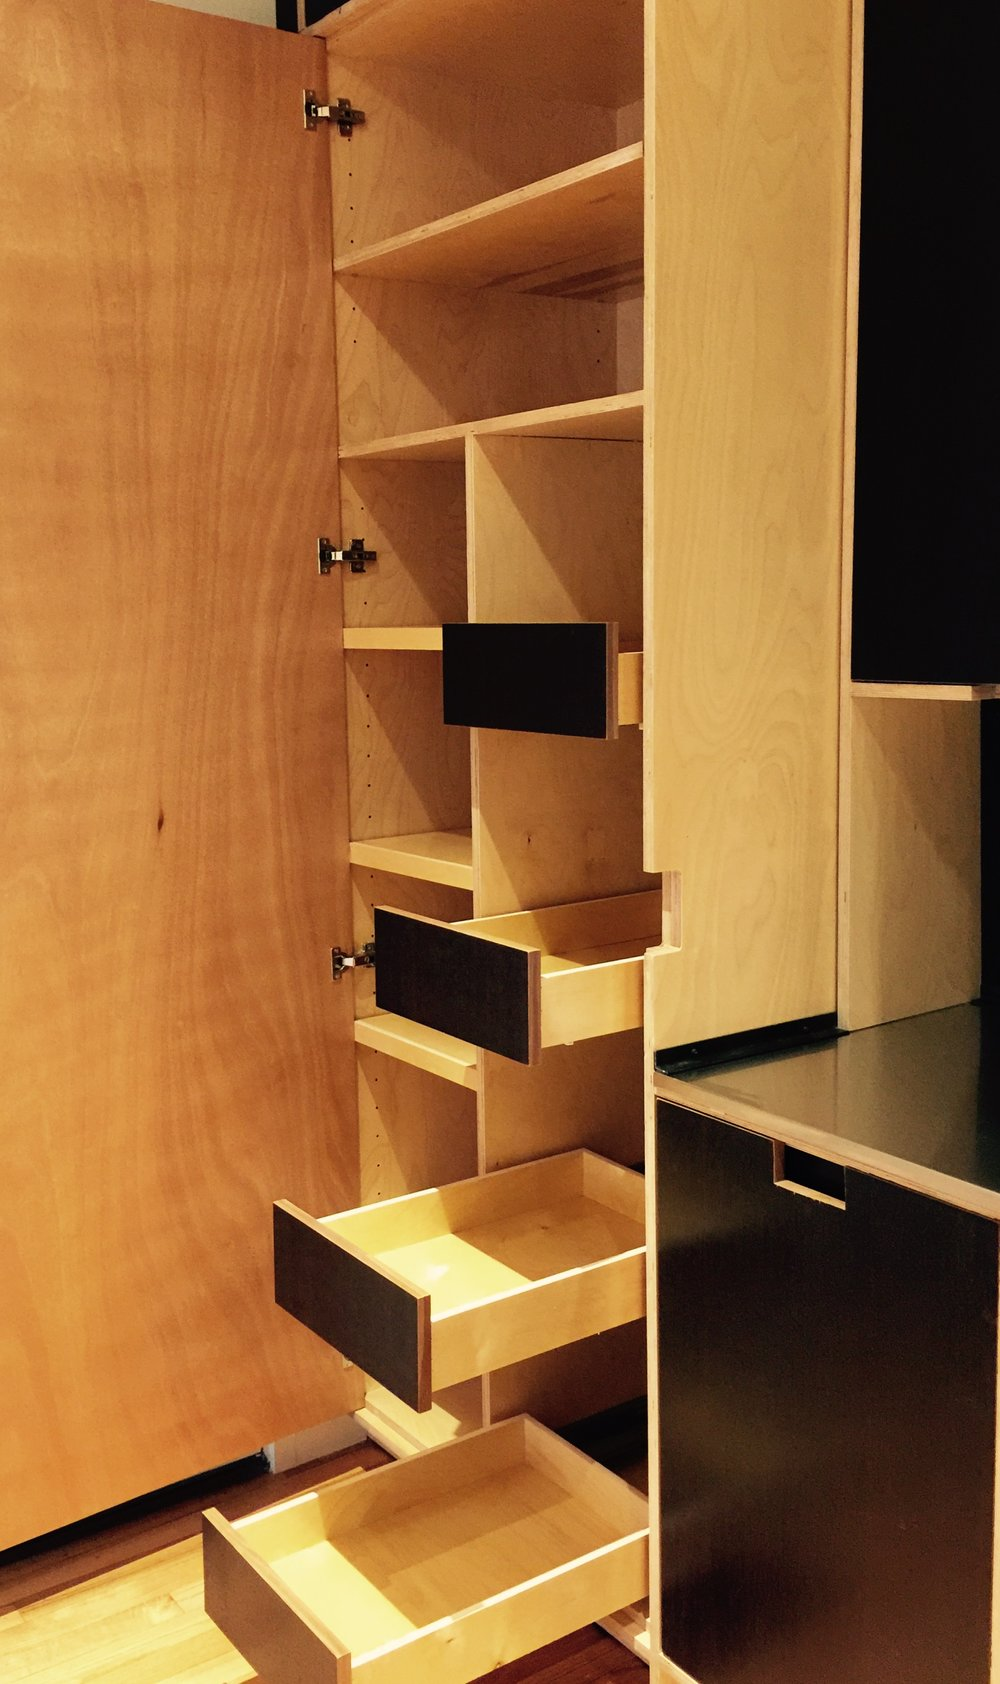 pantry drawers.jpg